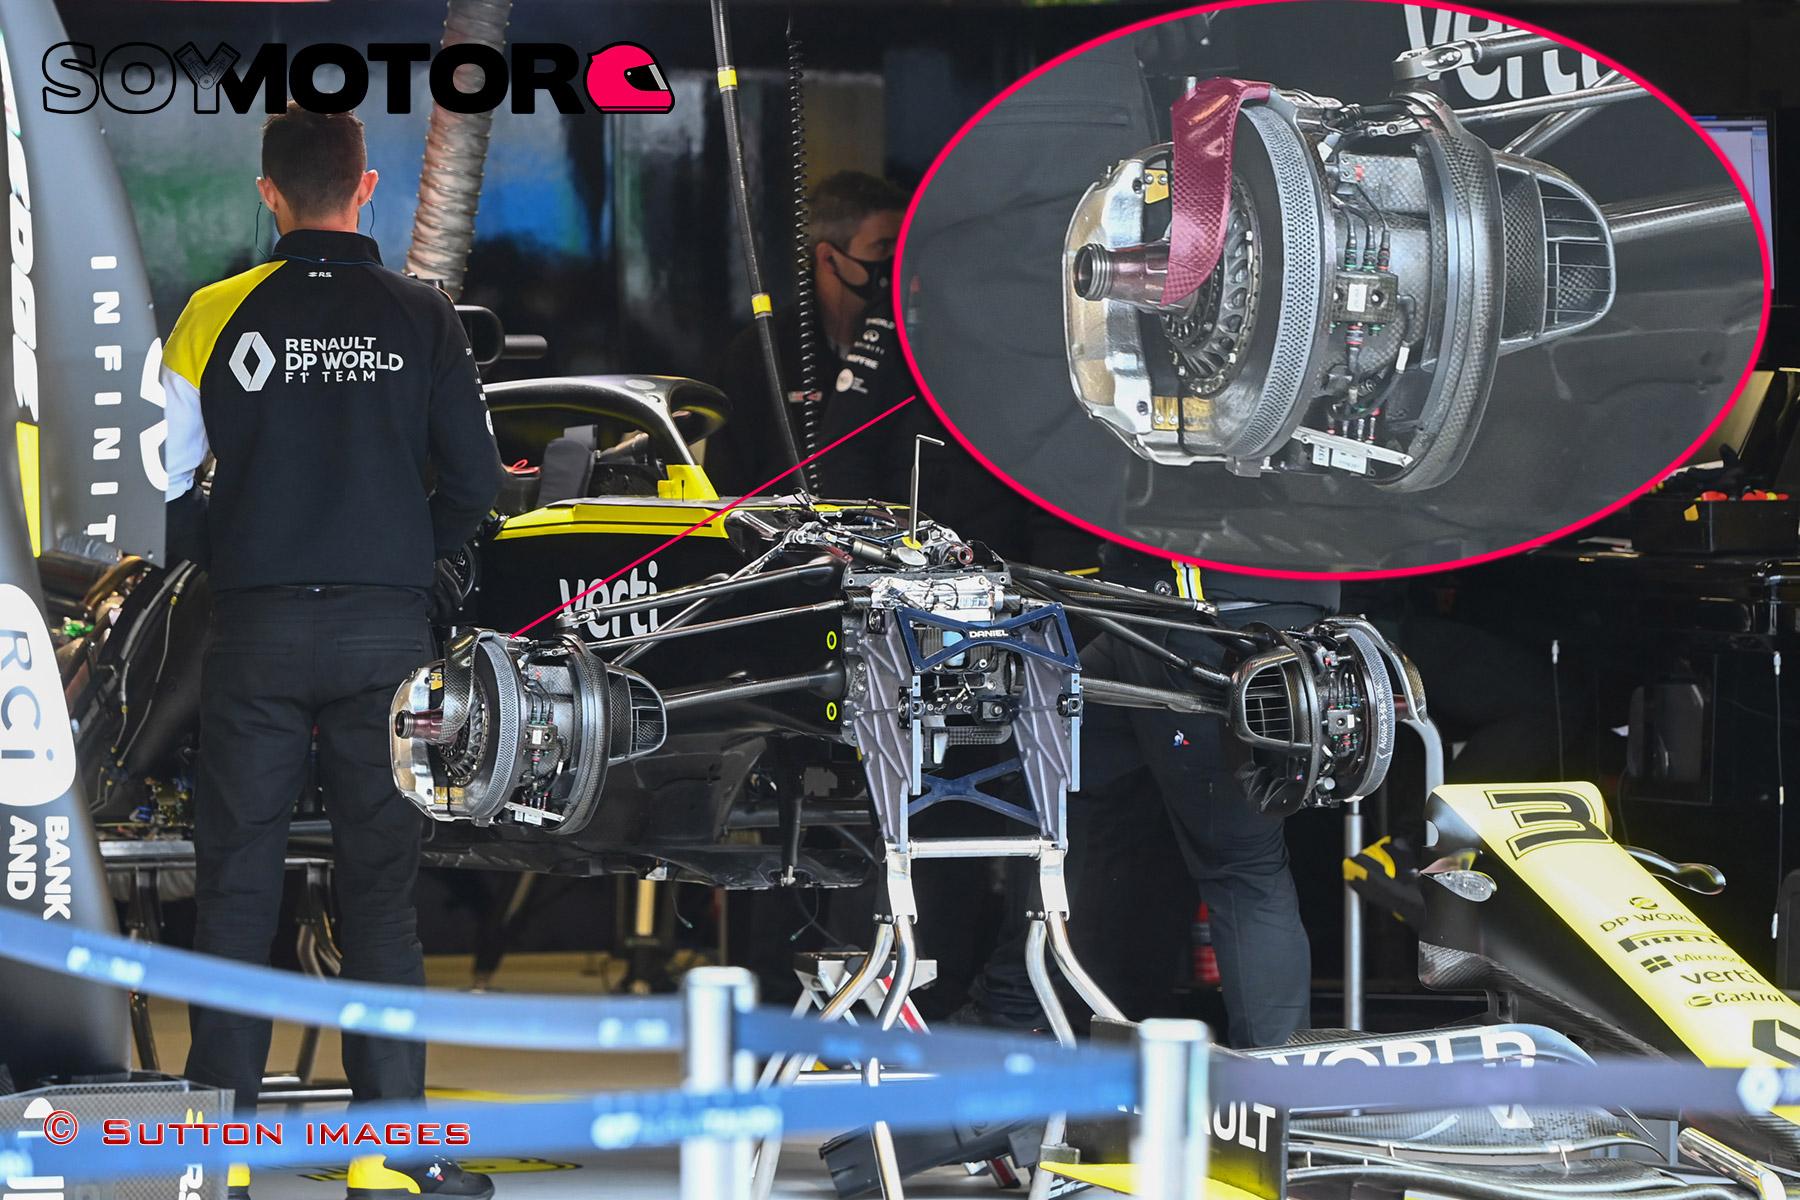 renault-frenos-delanteros-soymotor.jpg